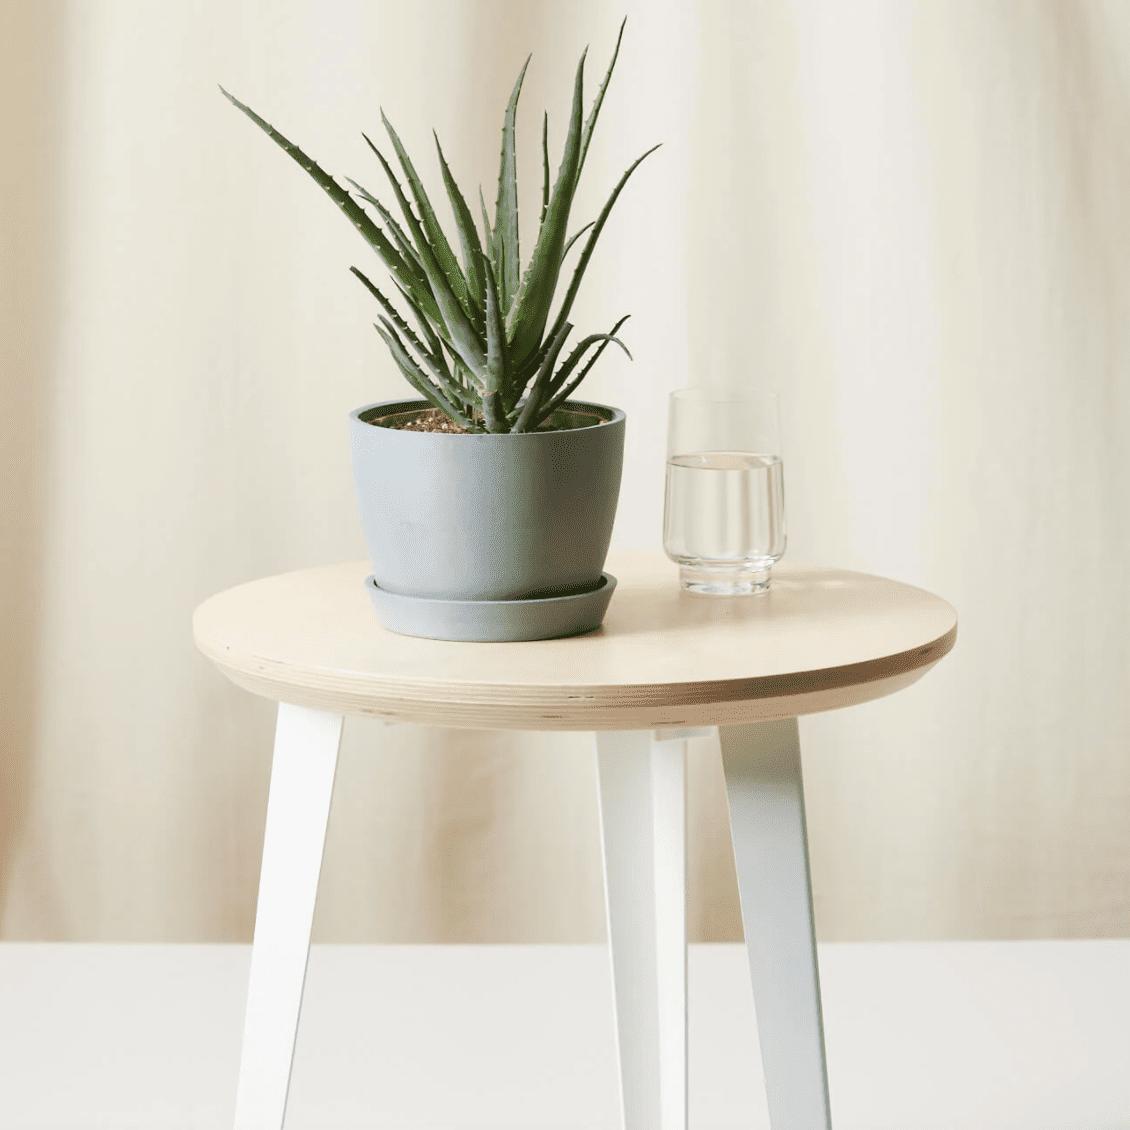 Bloomscape Hedgehog Aloe Plant